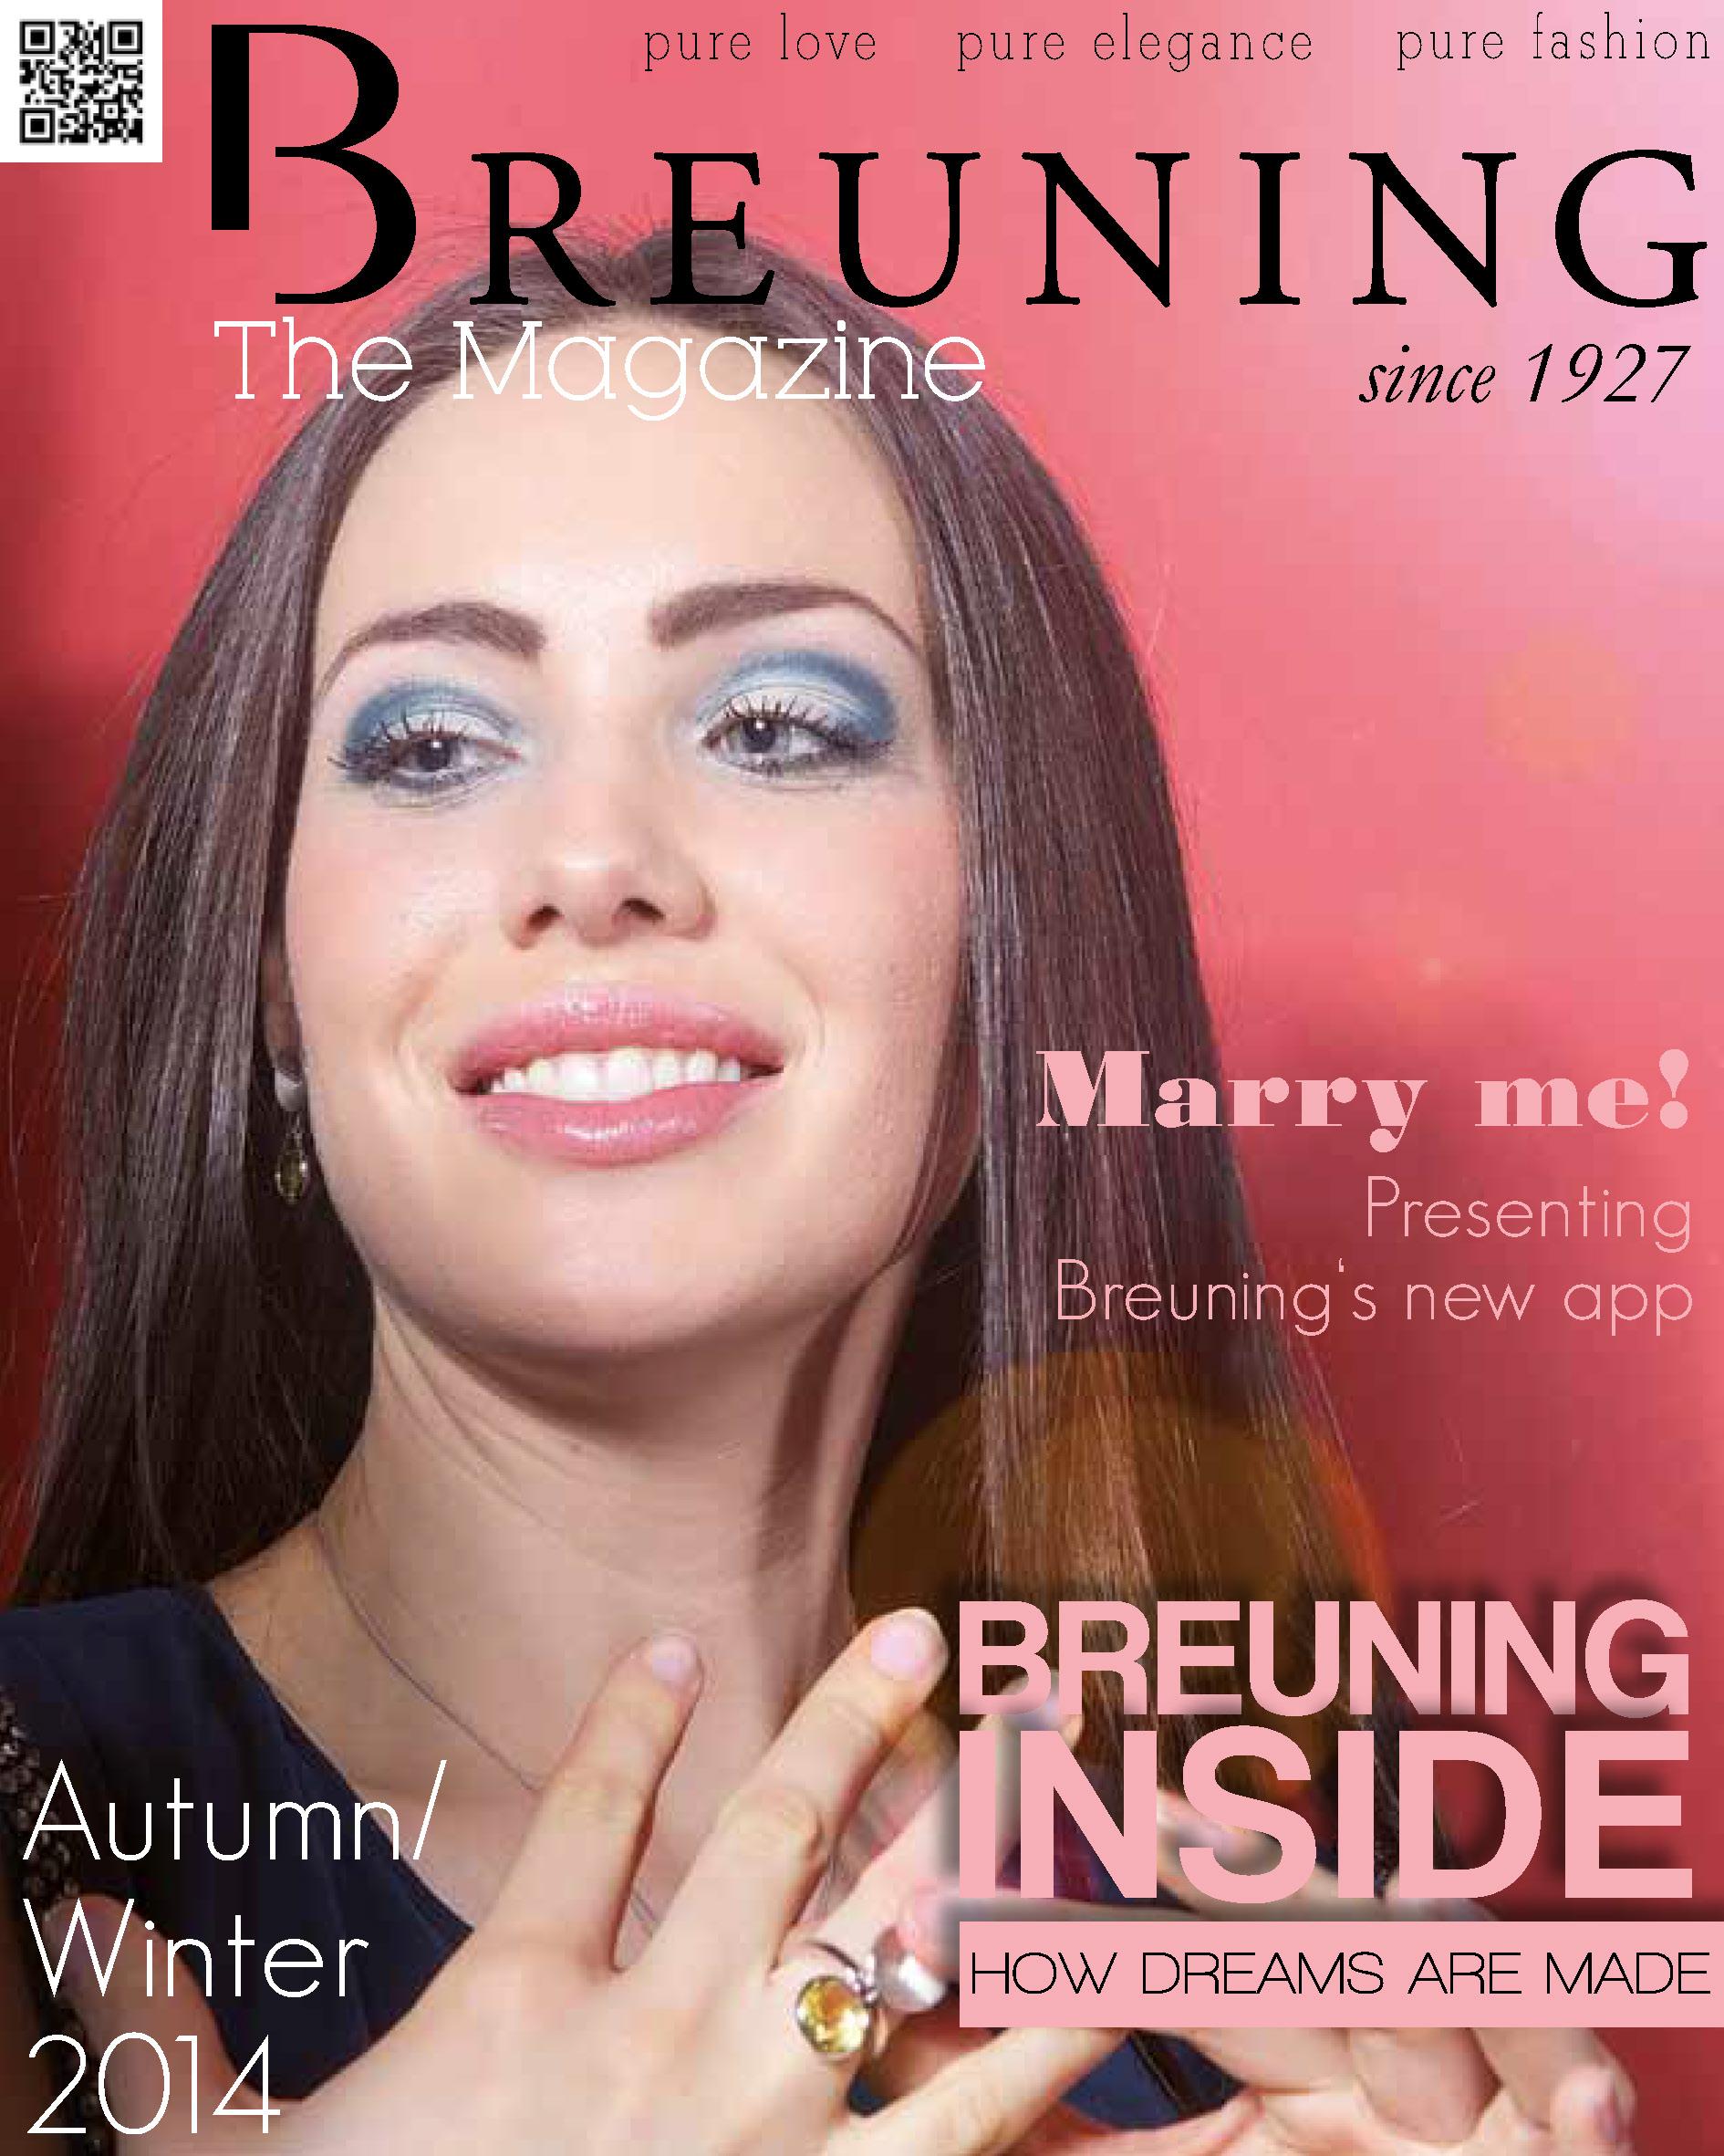 Breuning Magazine